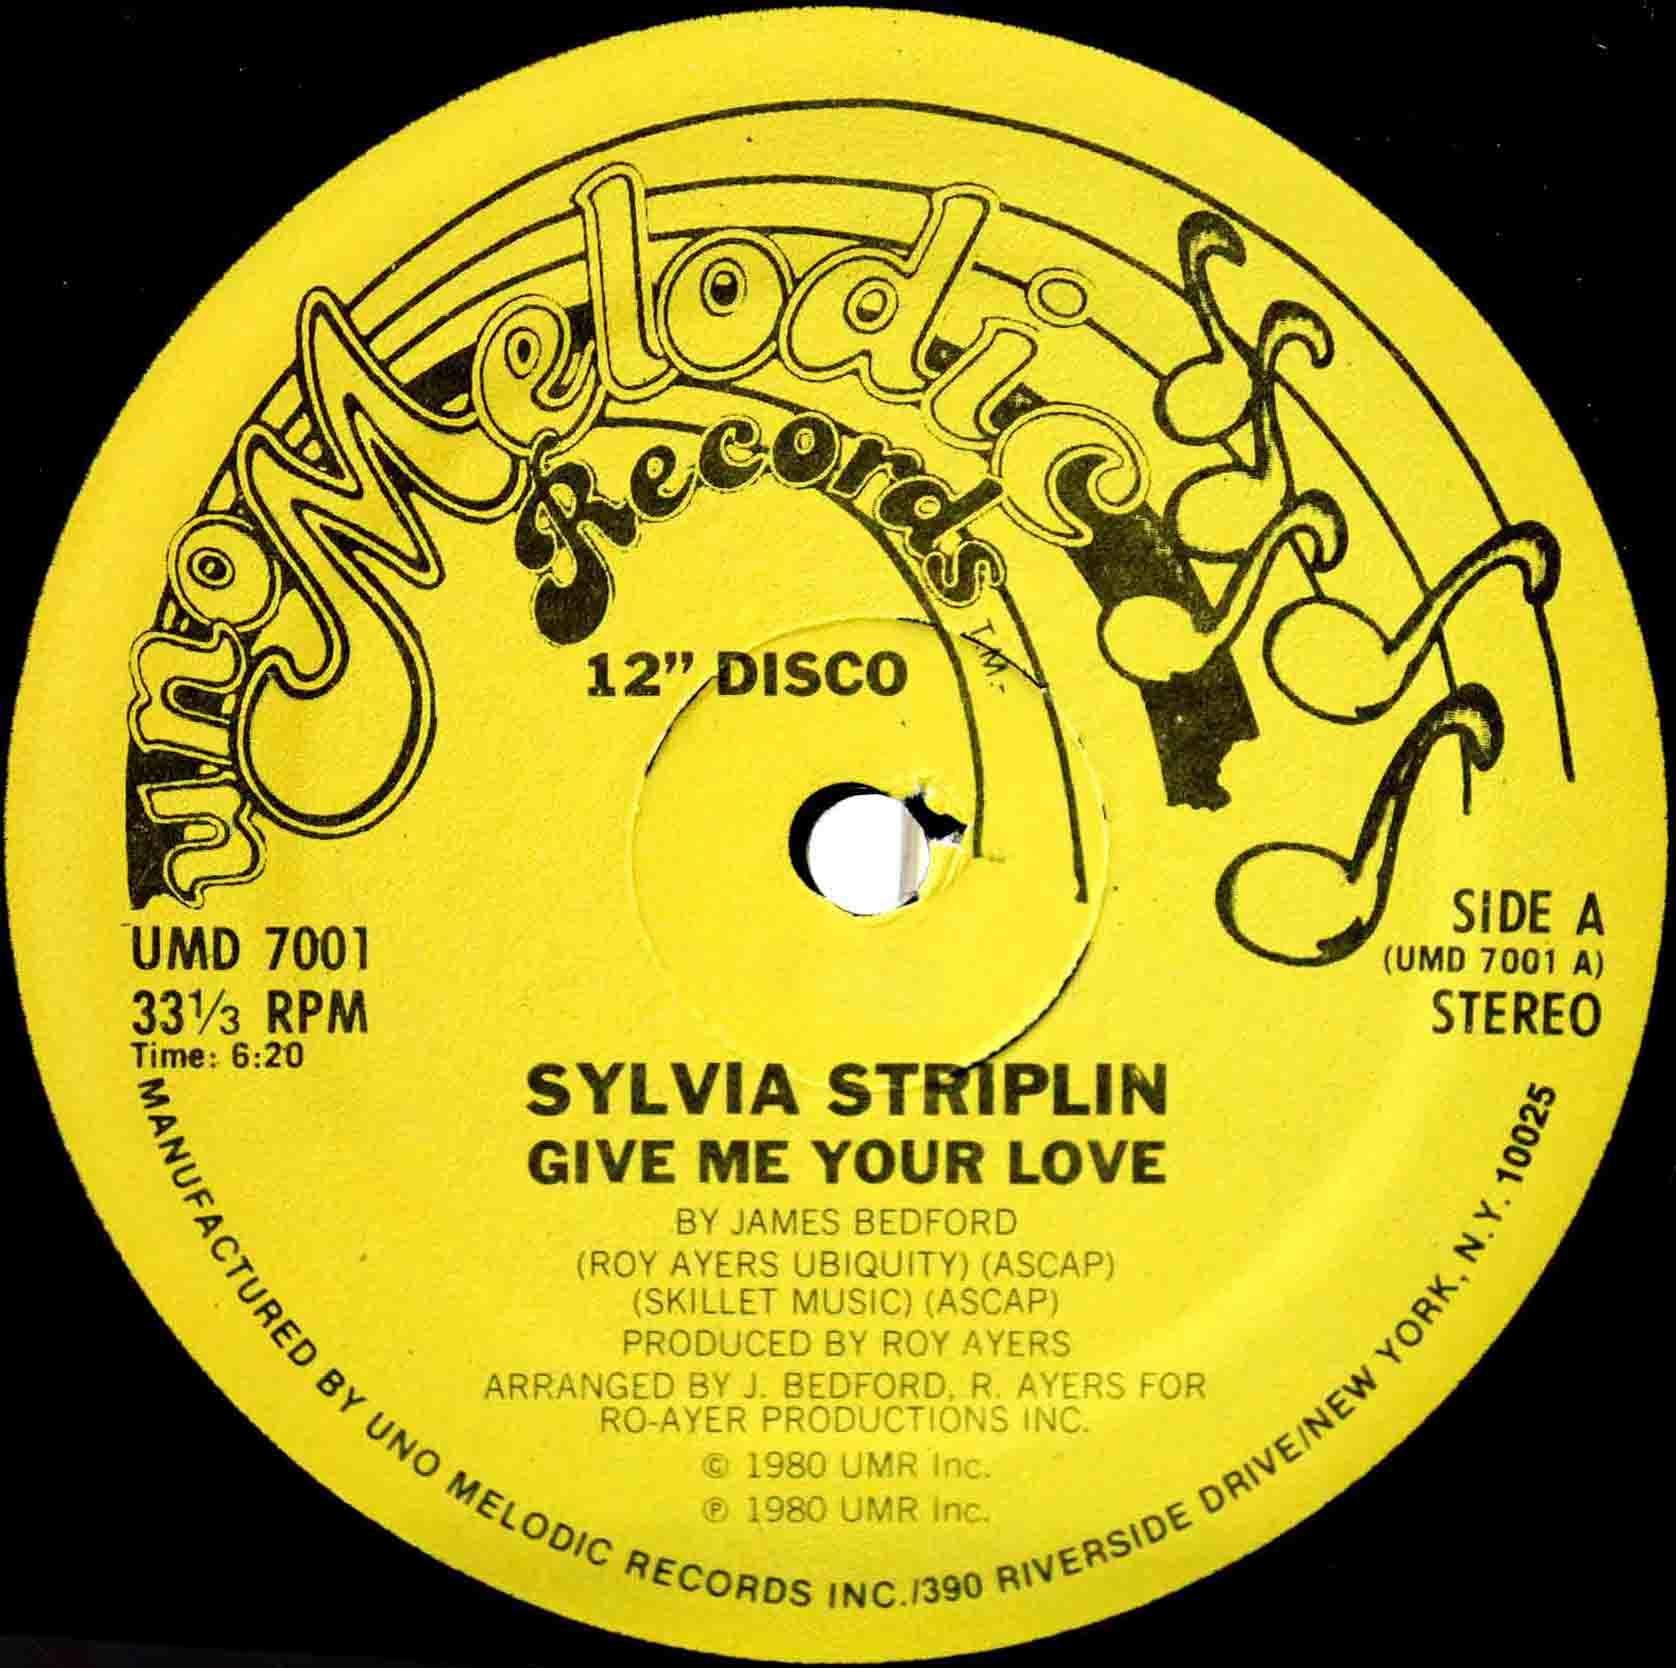 Sylvia Striplin - Give Me Your Love 03